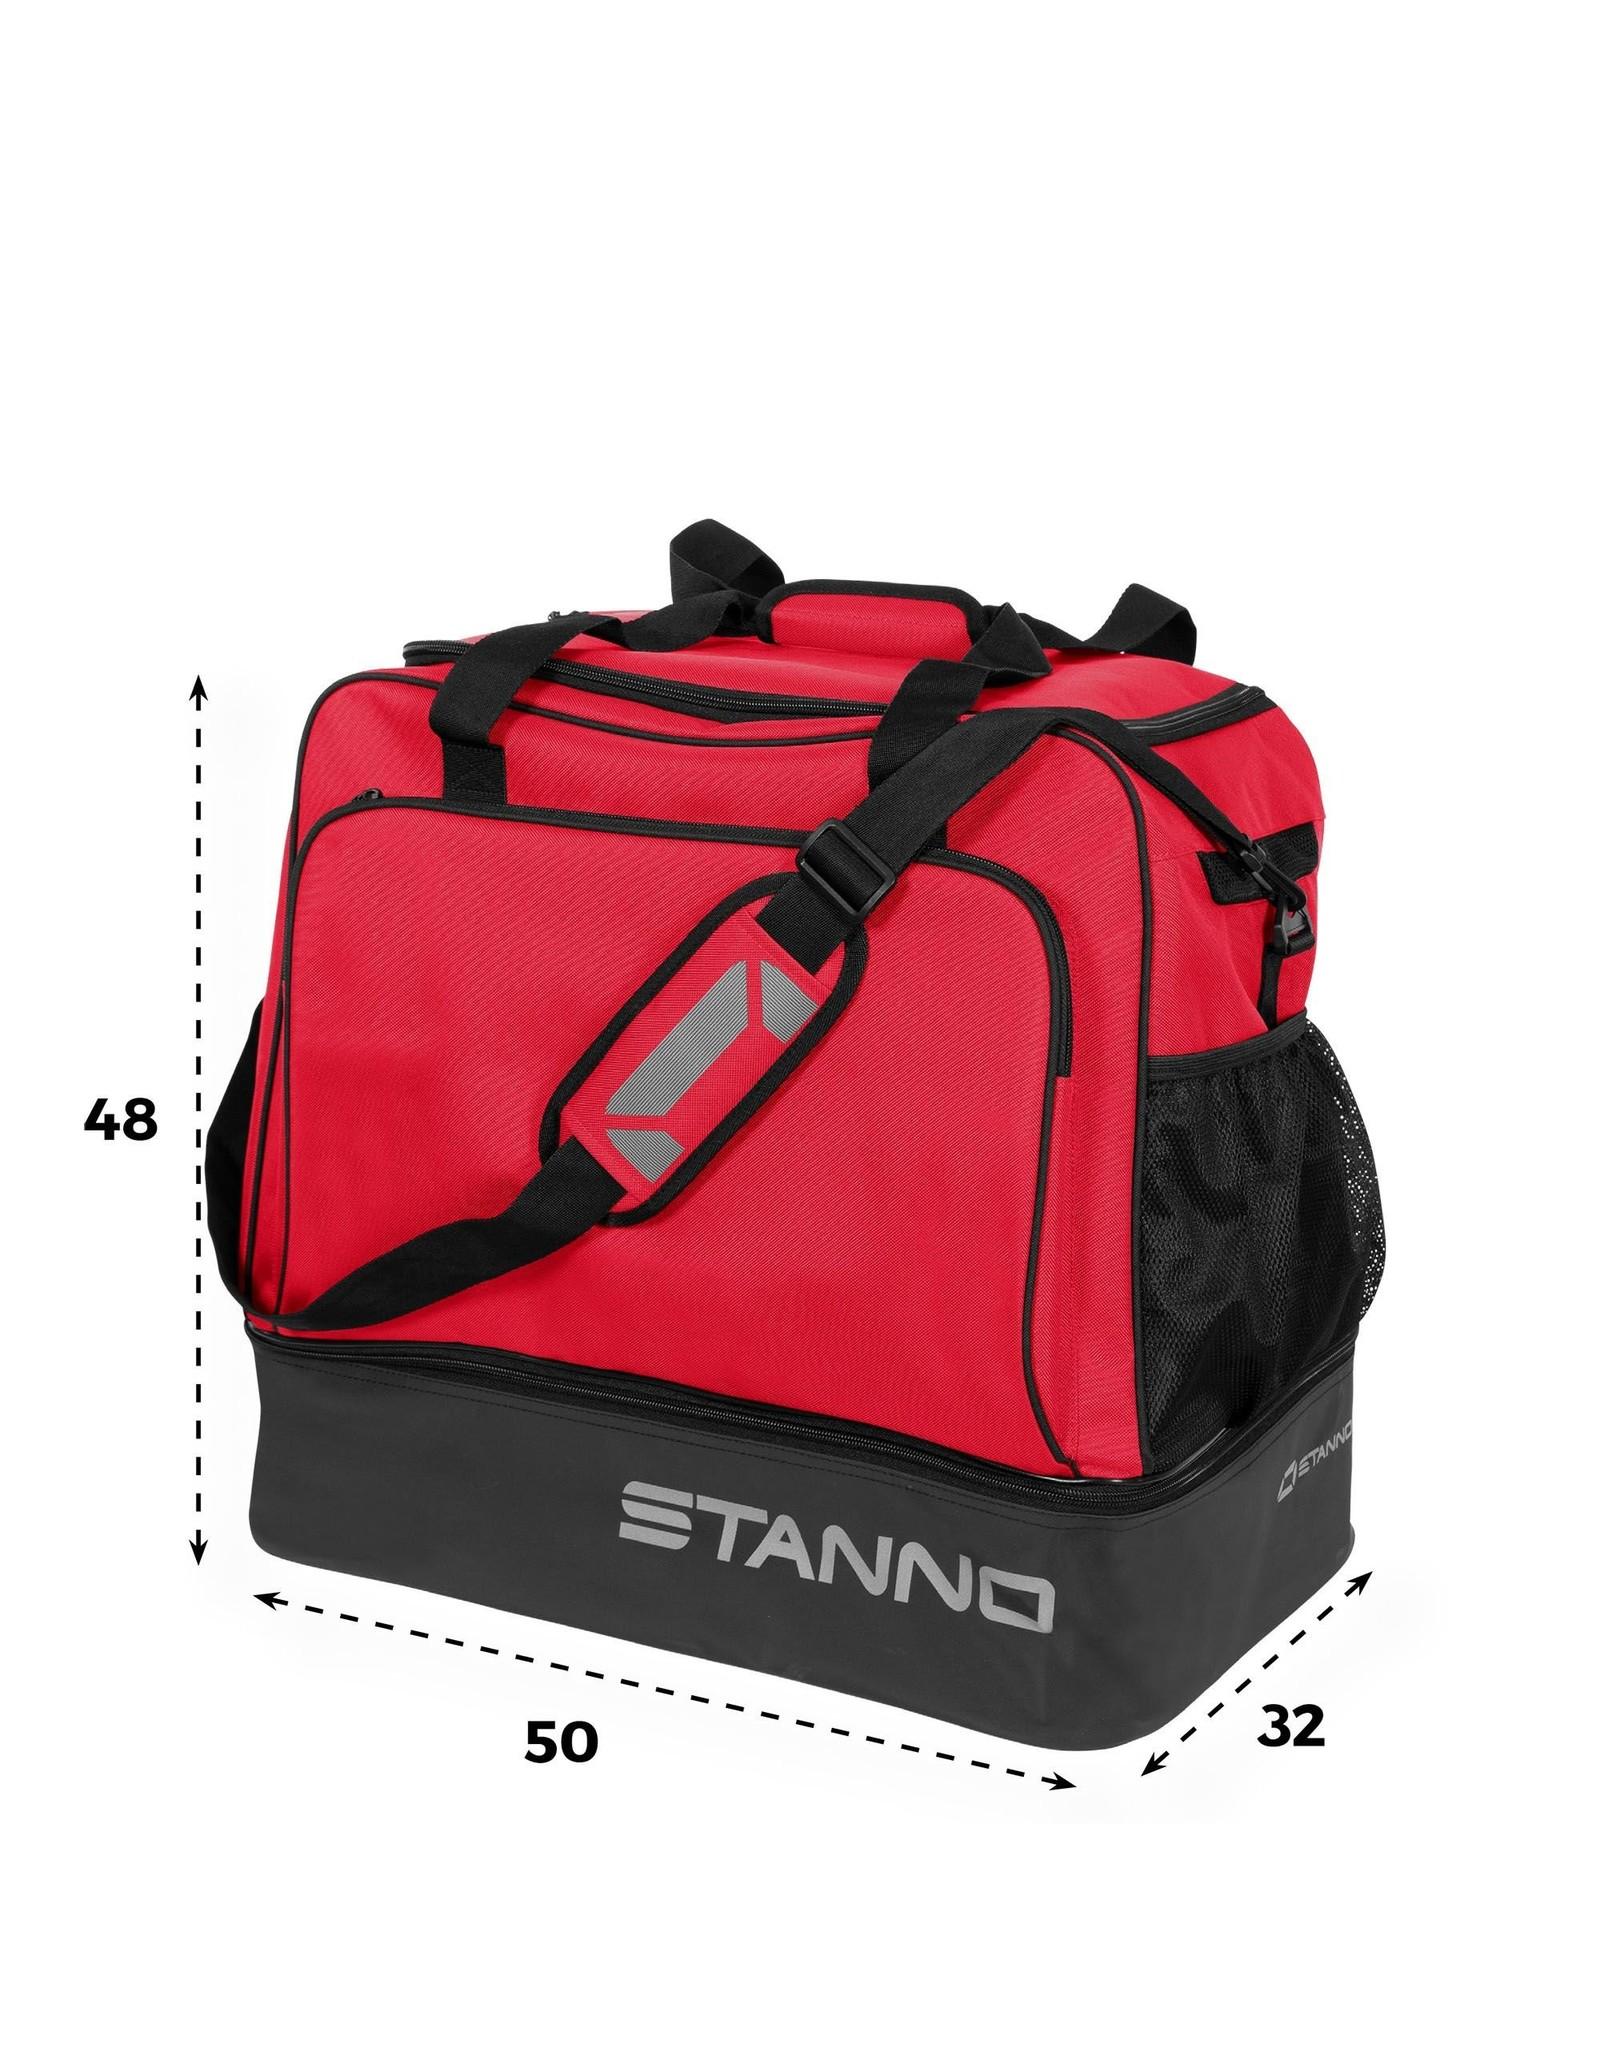 Stanno SVH'39 Pro bag Prime sporttas met bak